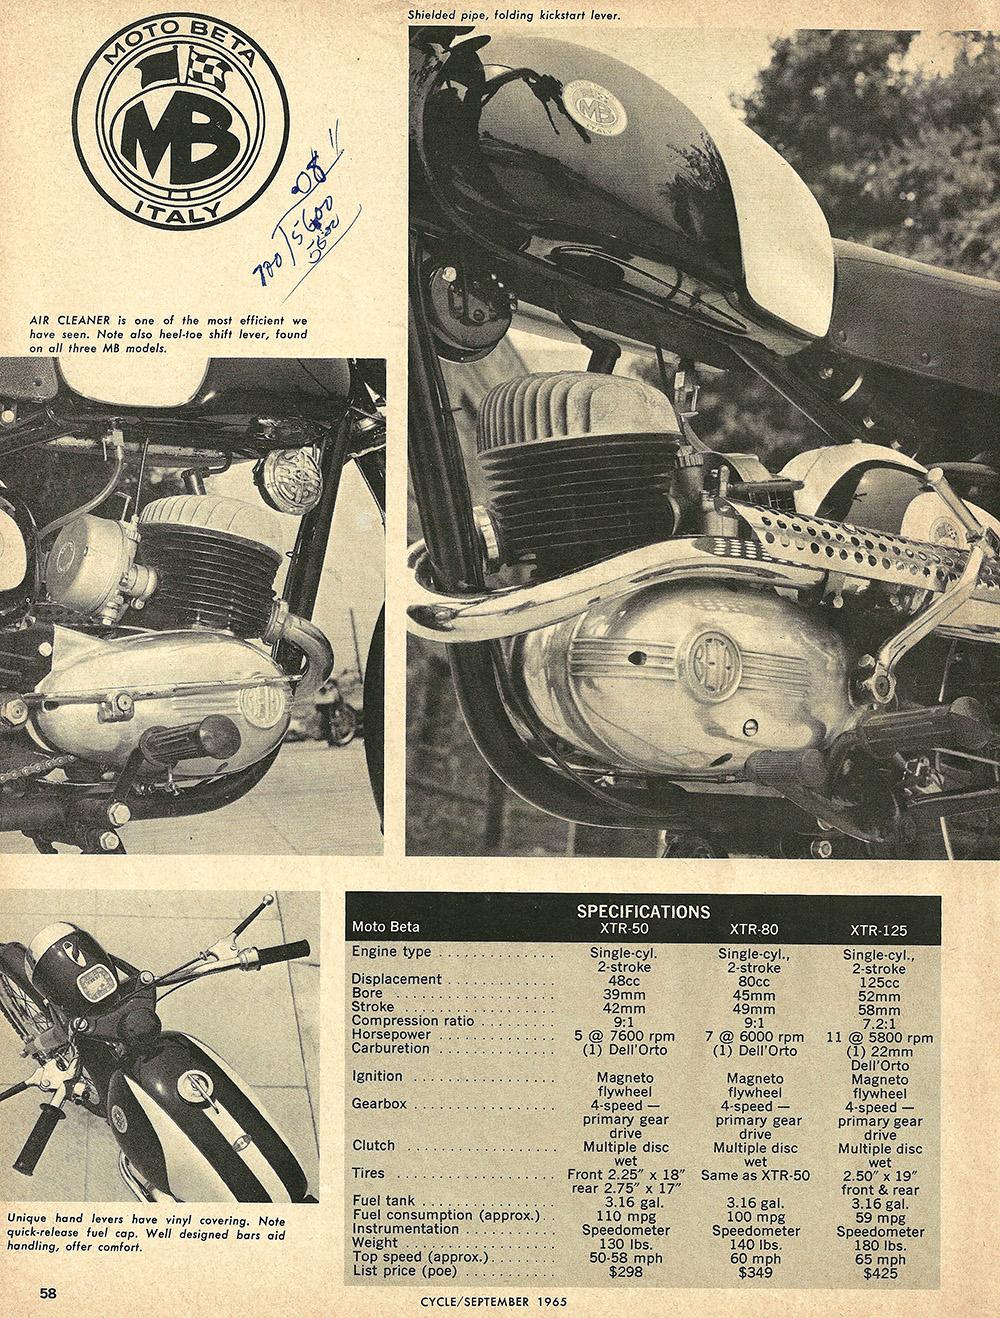 1966 Moto Beta 50cc 80cc 125cc road test 3.JPG